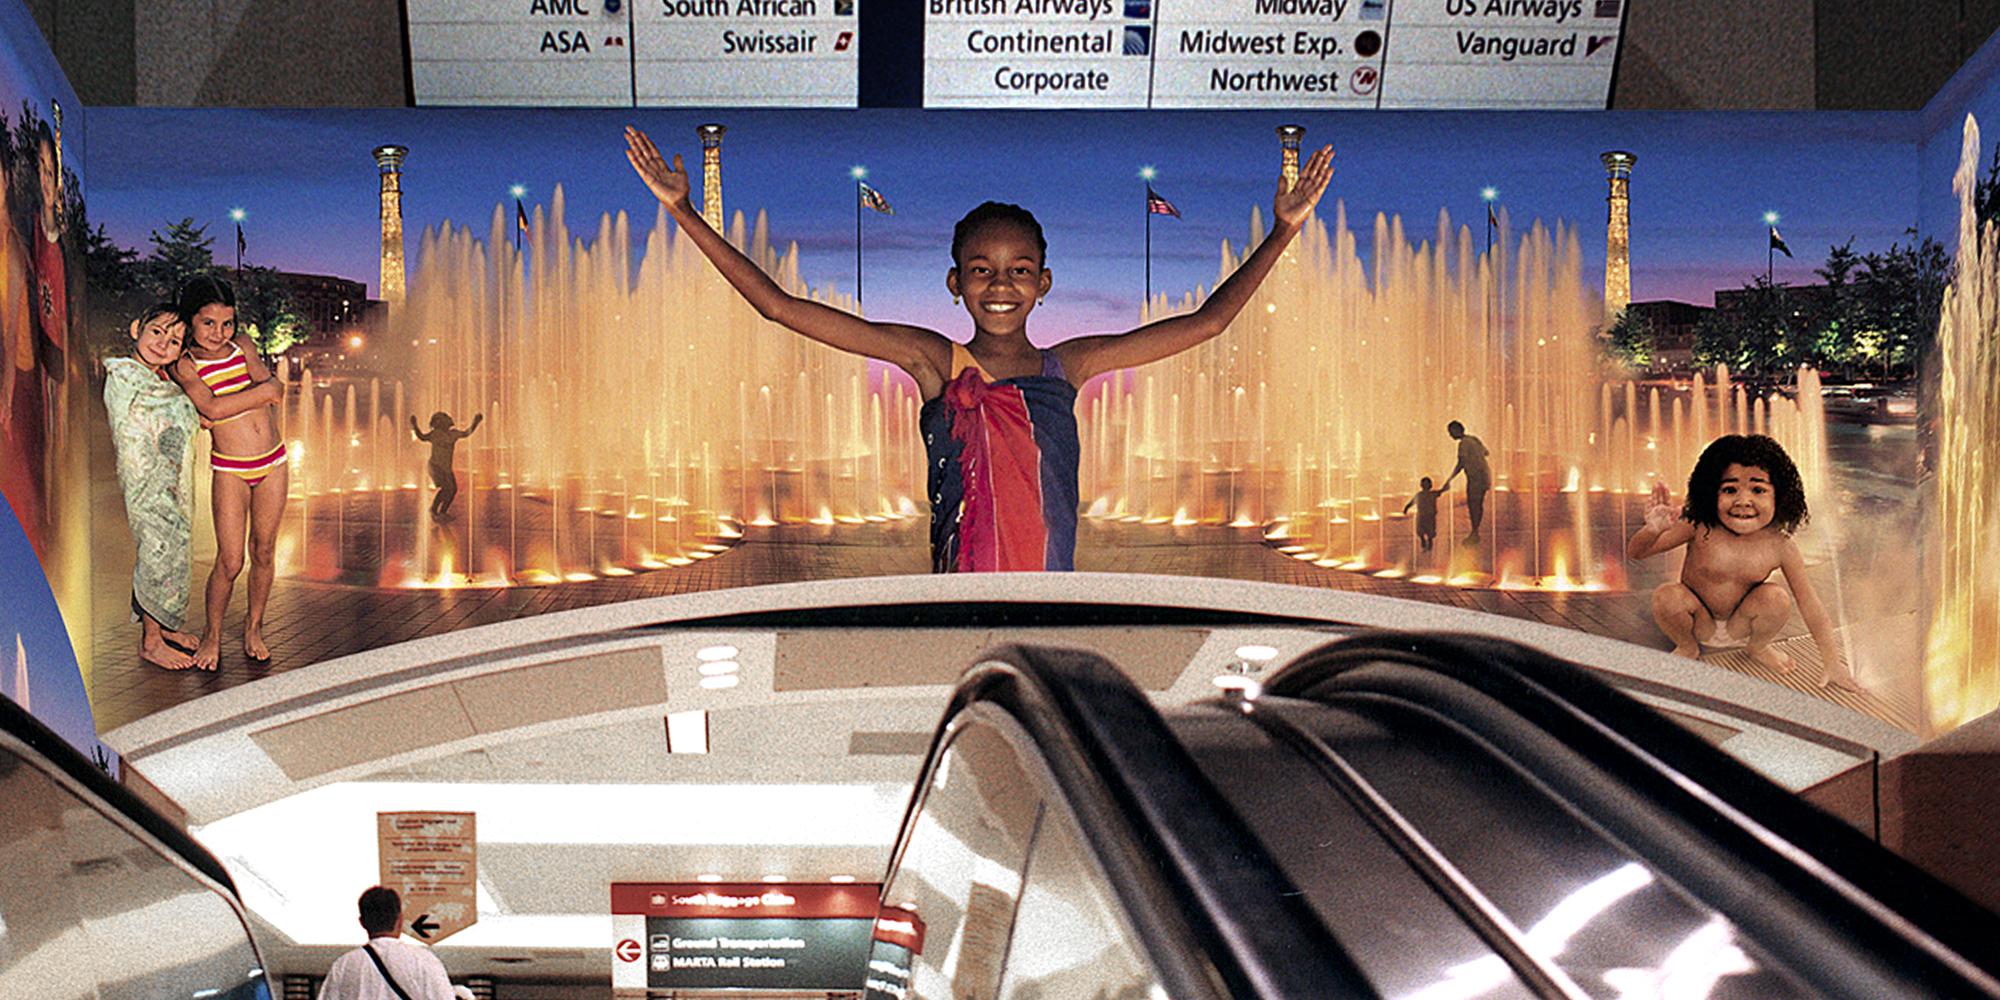 RETOUCHING/IMAGE EDITING - Atlanta International Airport Mural - ©UnParalleled, LLC dba UP-Ideas / Roger Sawhill / Mark Braught - Atlanta, Georgia | Lawrenceville, Georgia | Commerce, Georgia